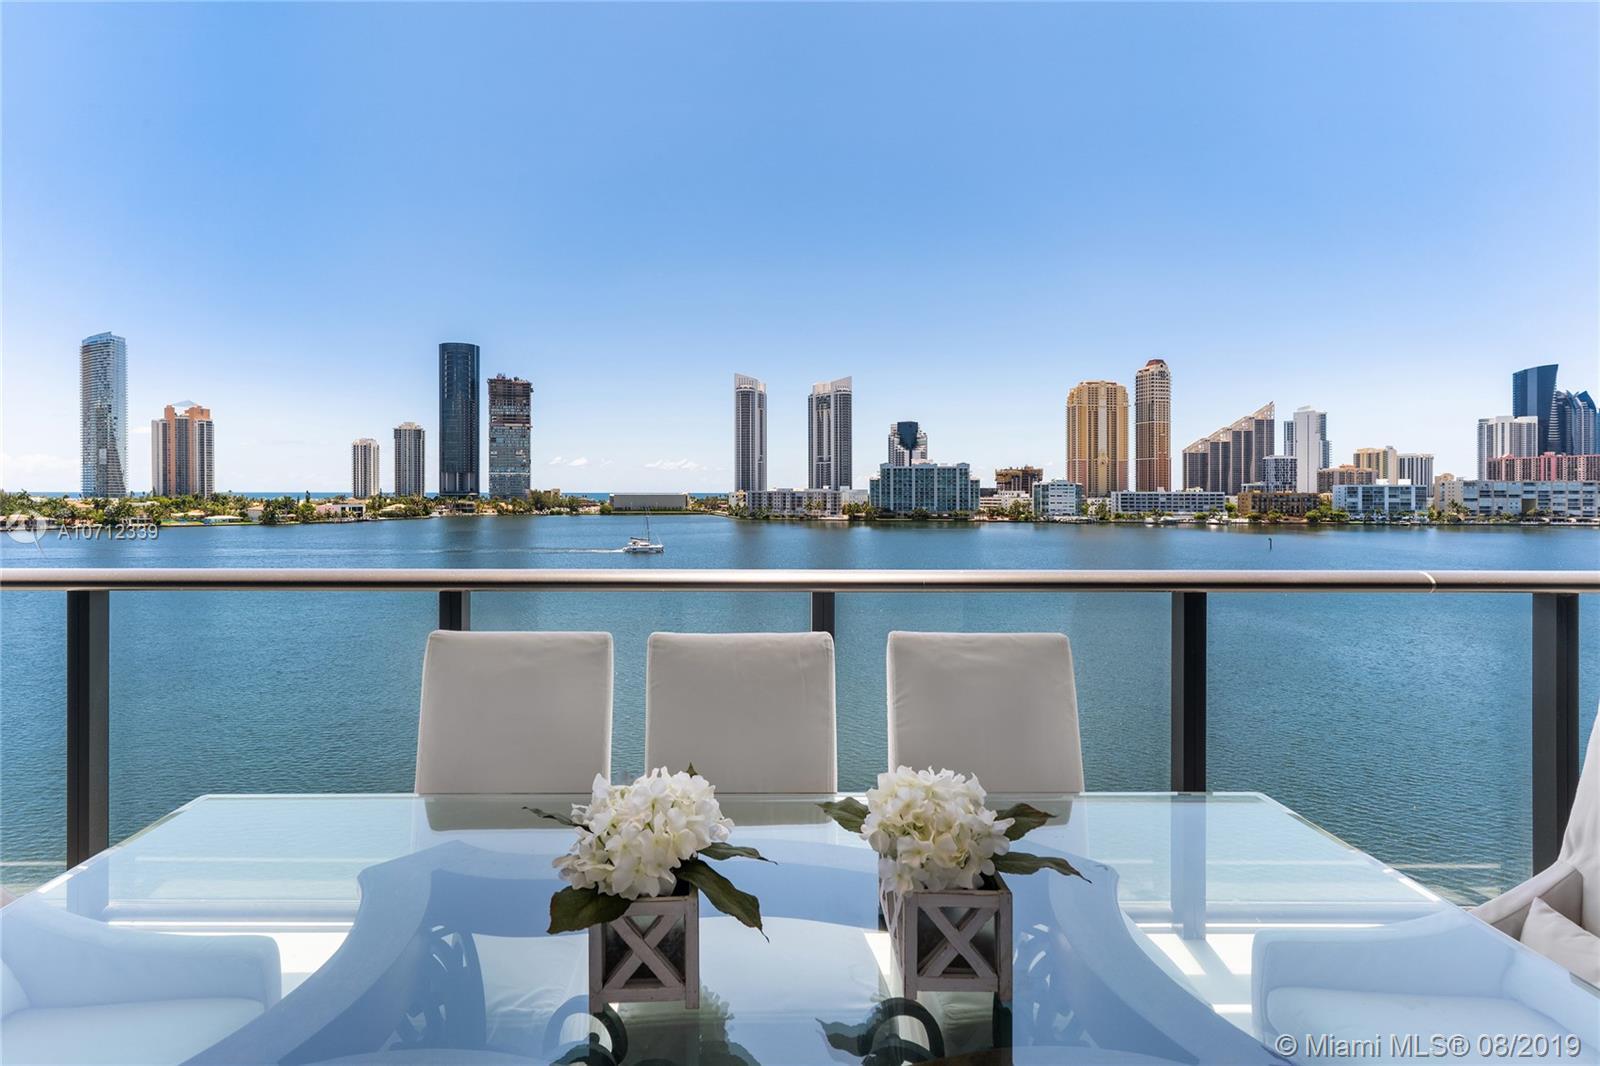 5000 Island Estates Dr #508, Aventura, FL 33180 - Aventura, FL real estate listing